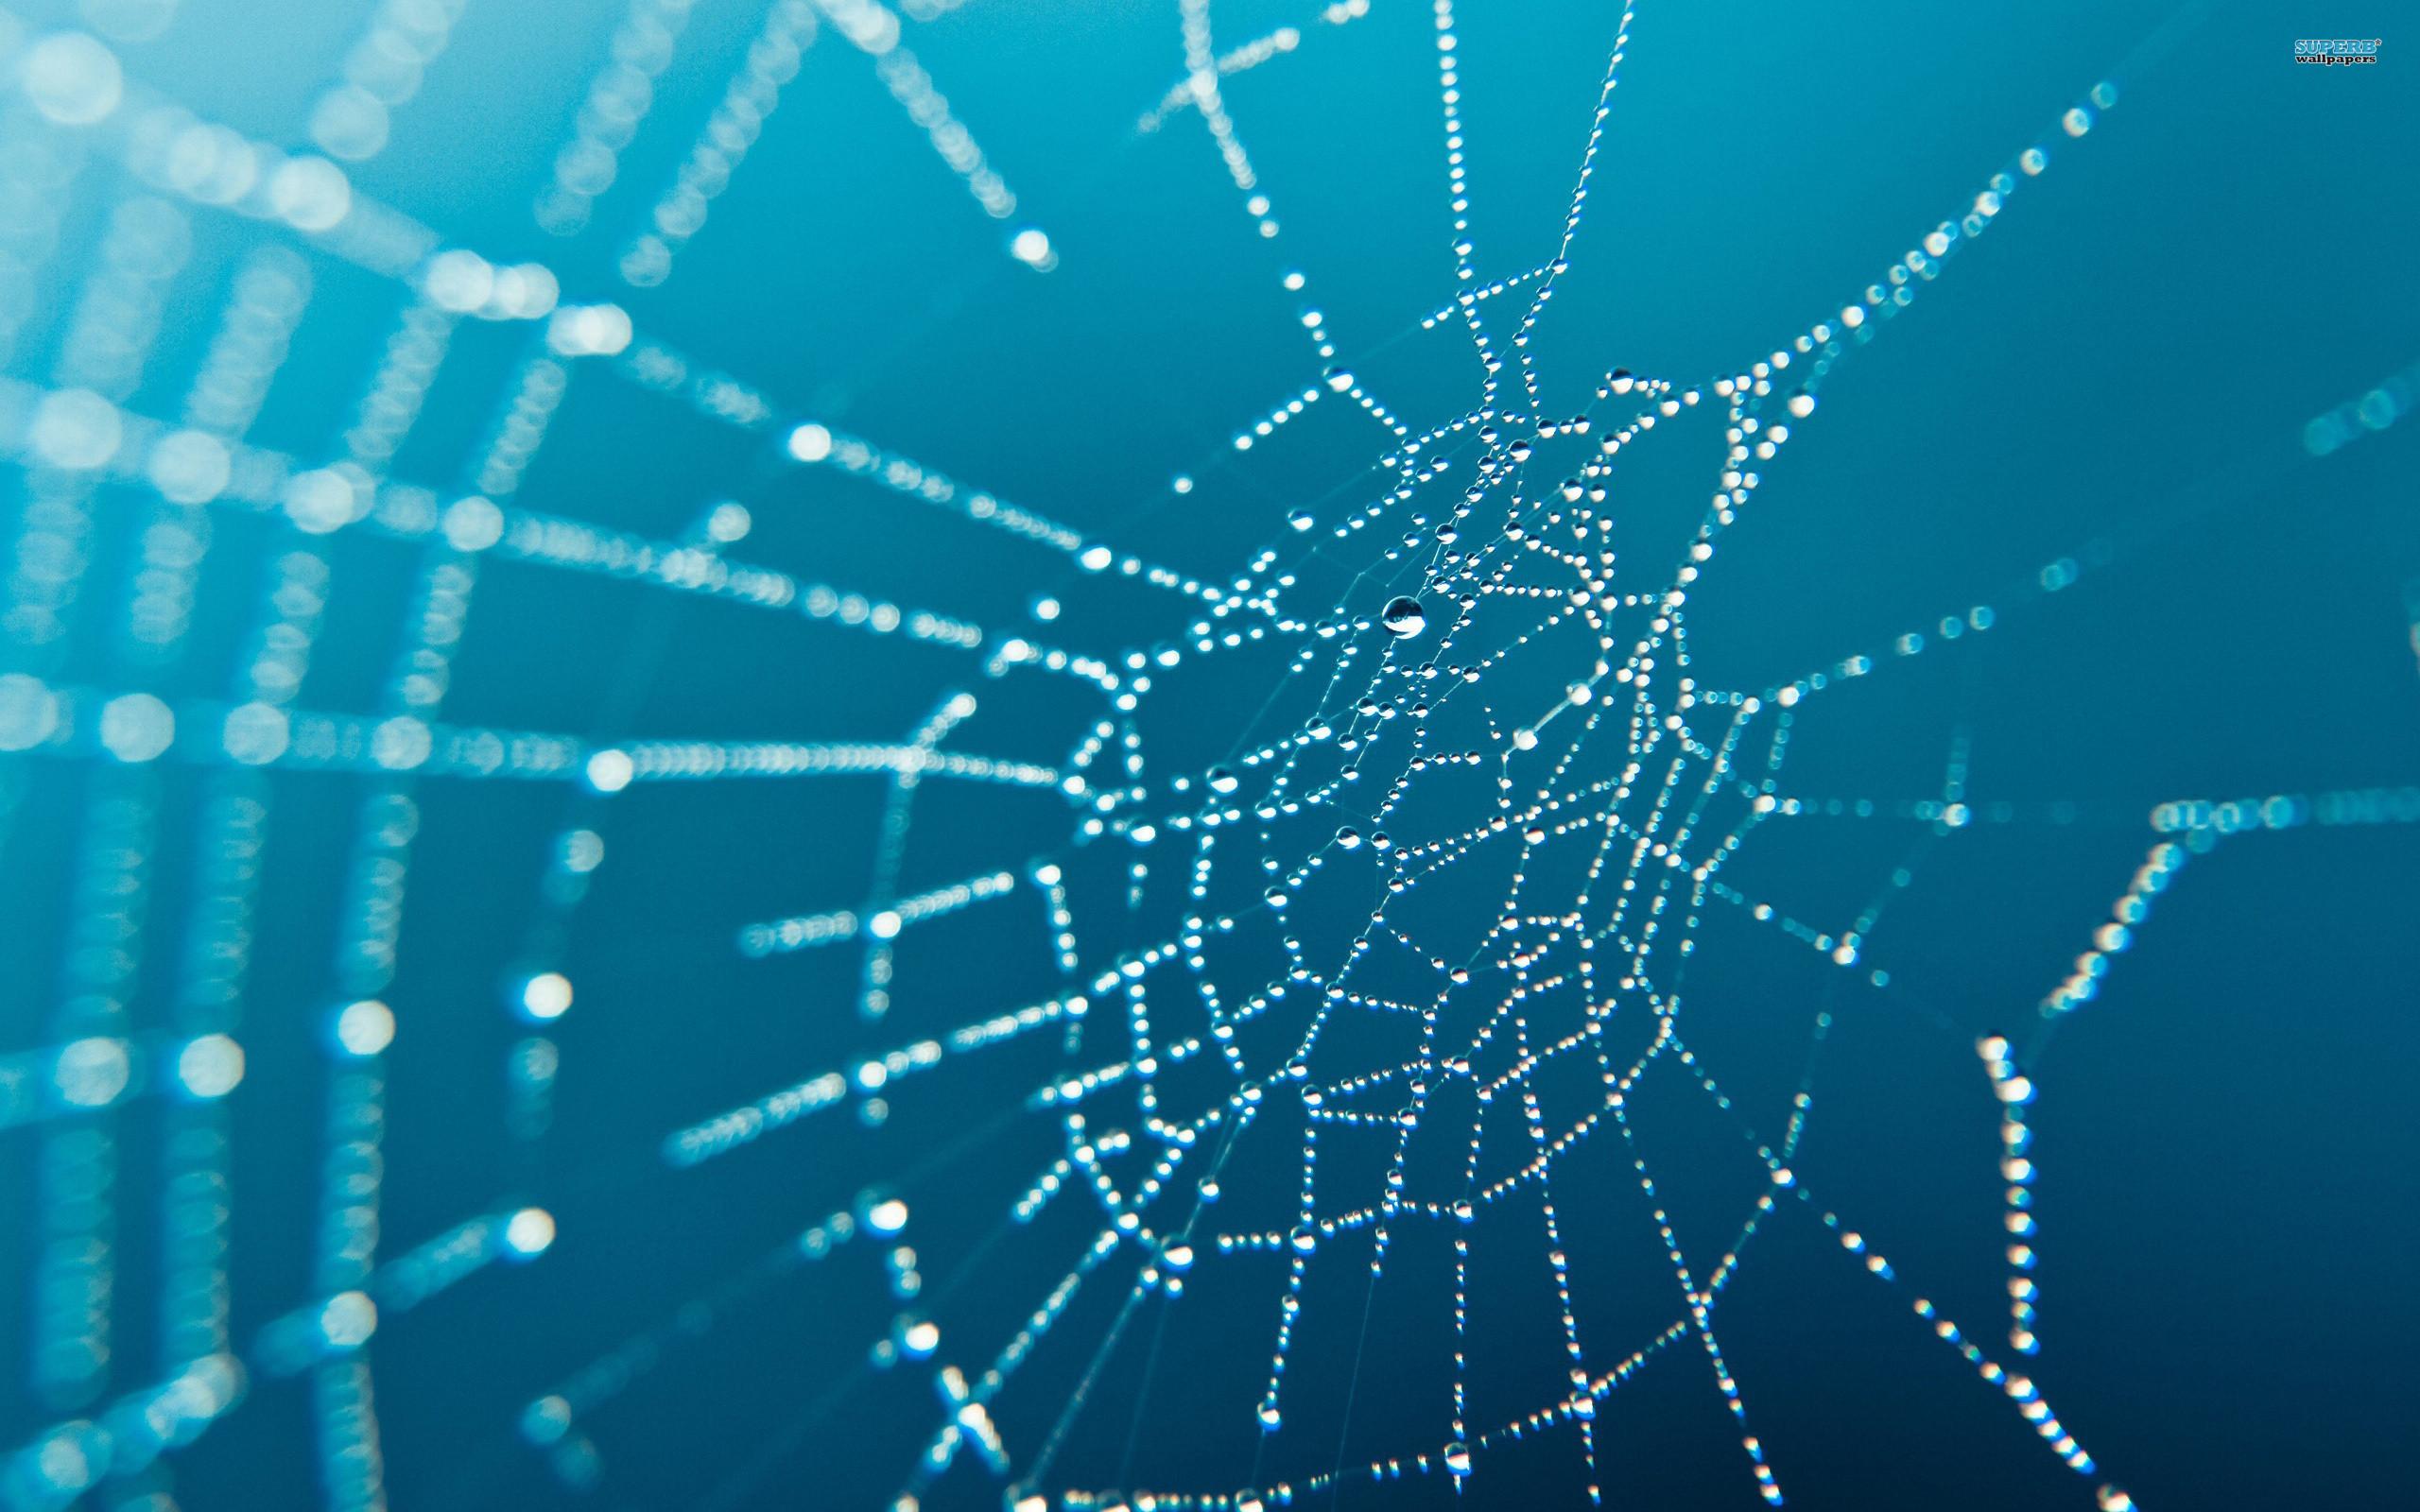 spider-web-wallpaper-2